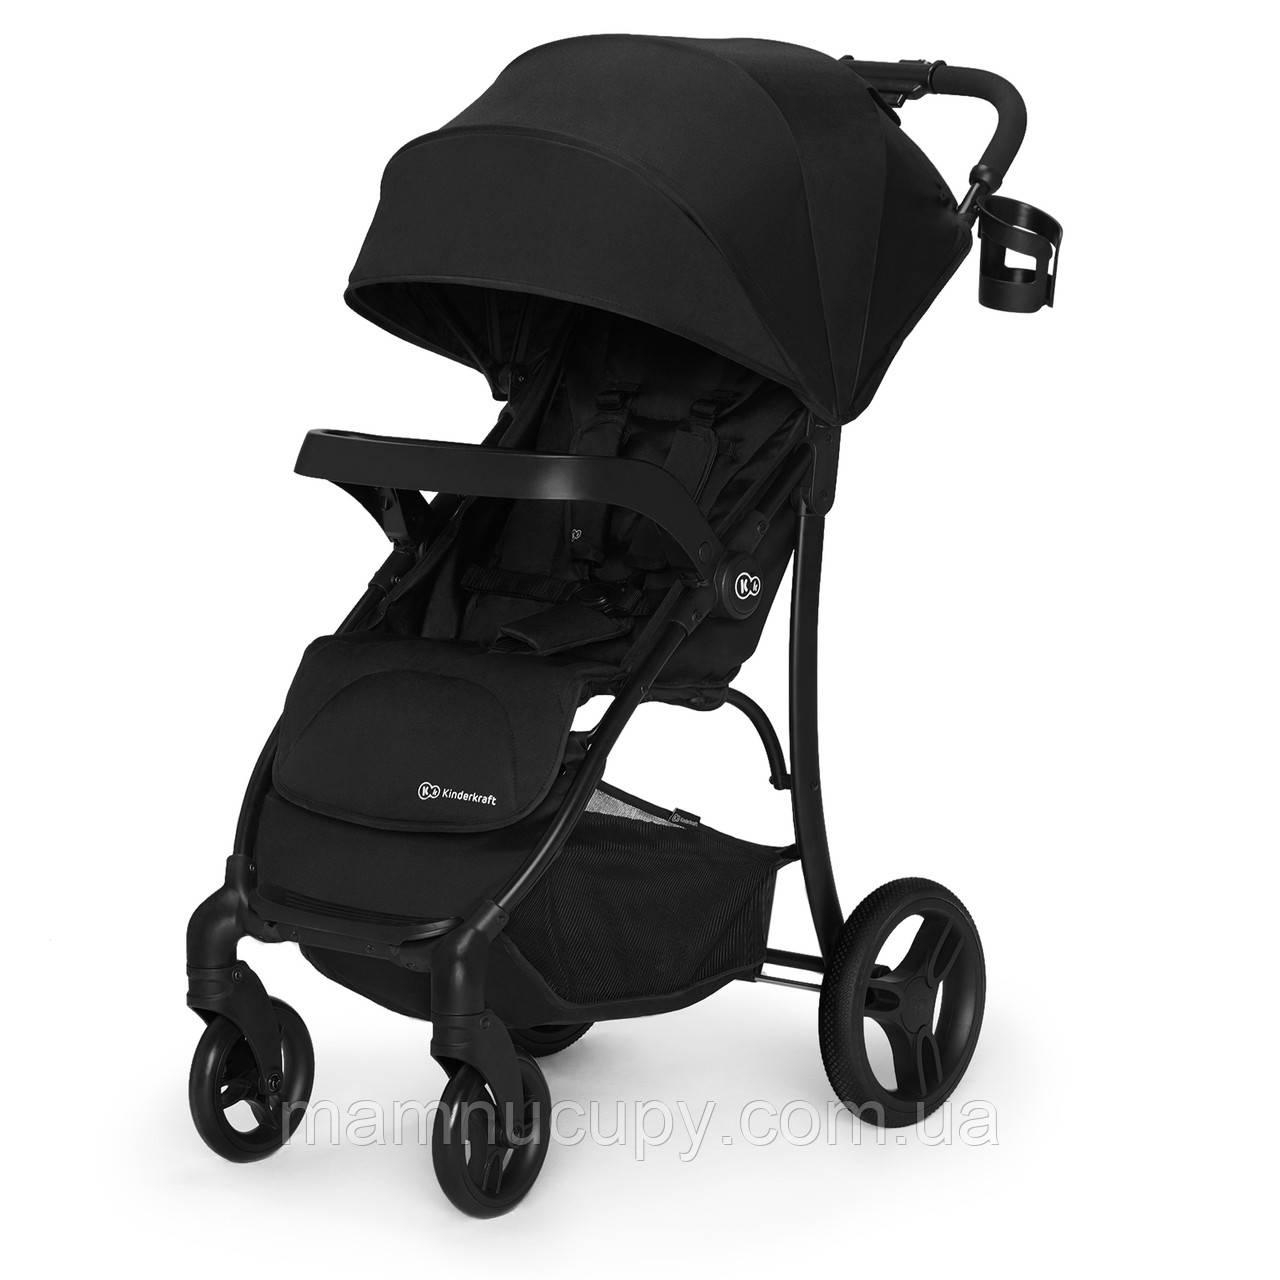 Детская прогулочная коляска Kinderkraft Cruiser Black (Киндеркрафт)